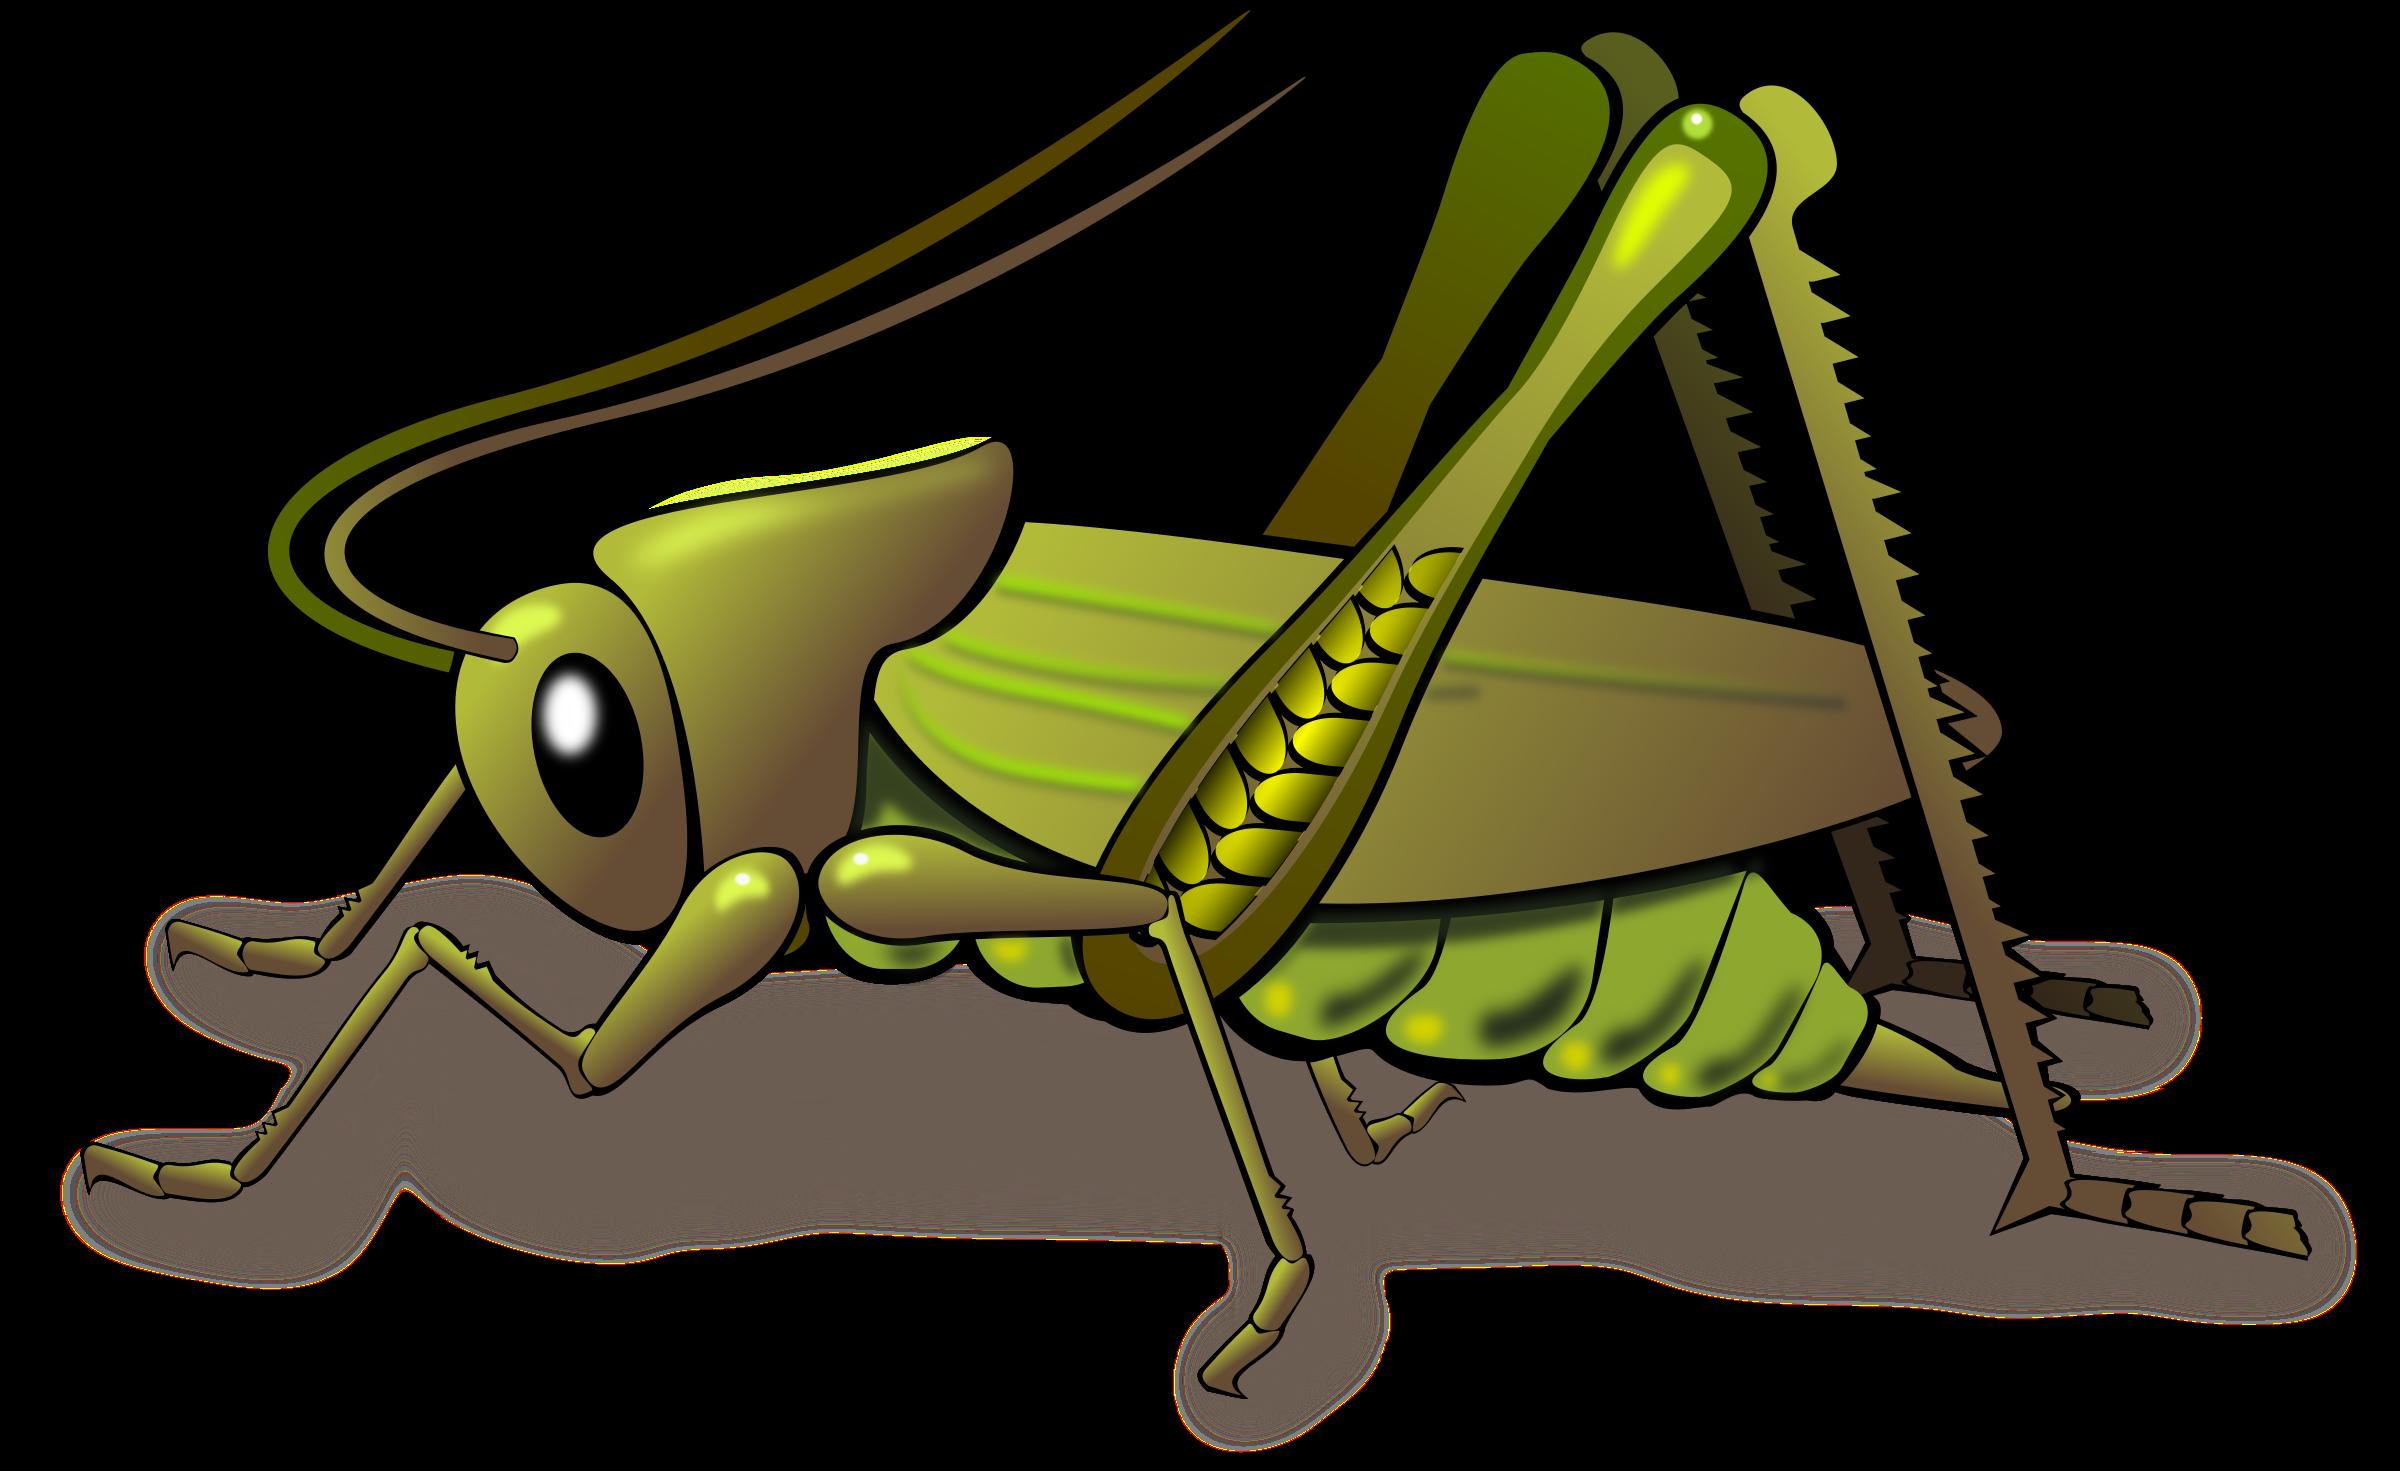 Grasshopper Clipart & Grasshopper Clip Art Images.